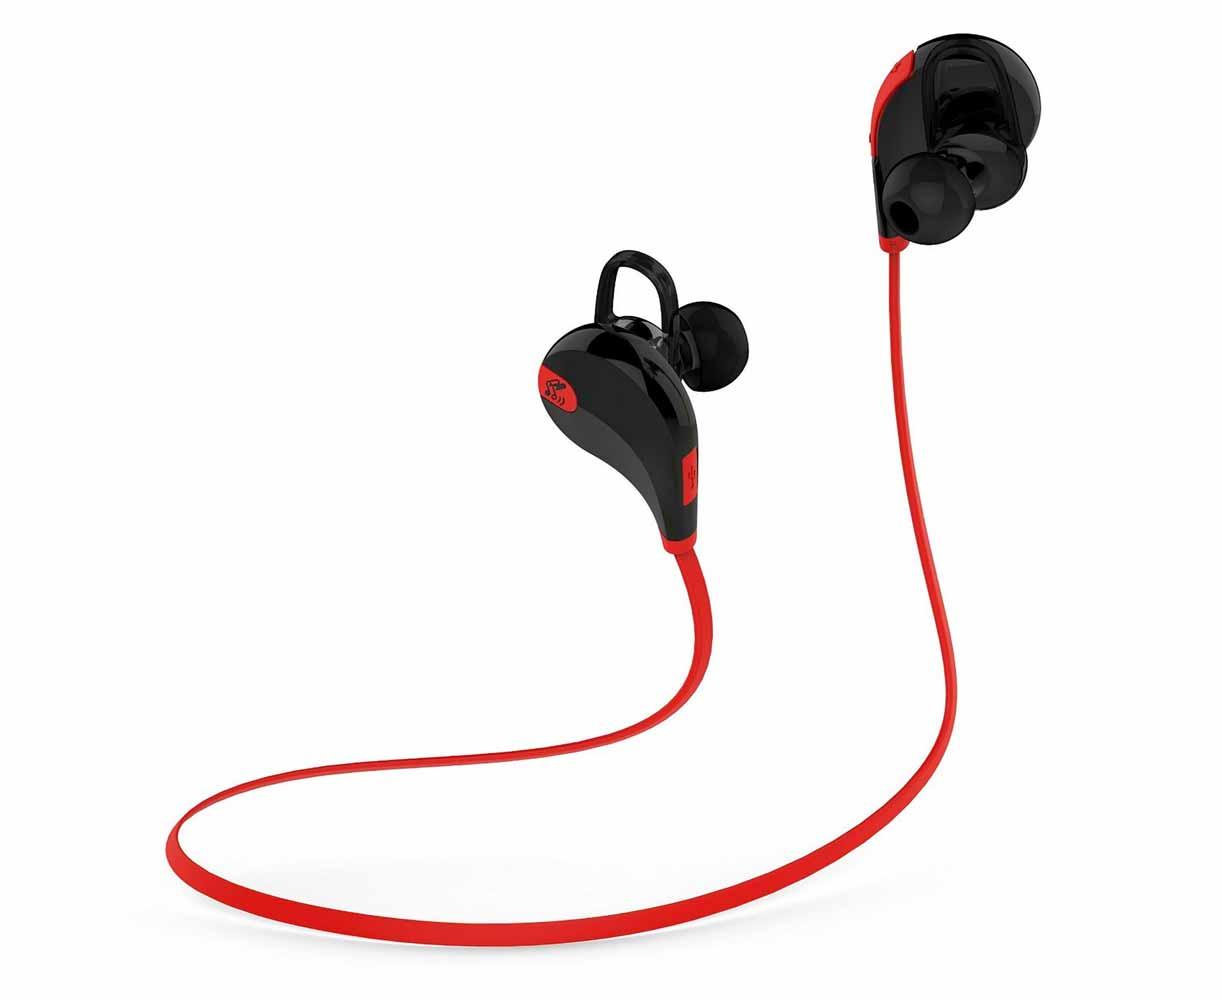 Amazon、Bluetoothヘッドセット「Soundpeats QY7(black/red)」を2,399円で販売中(8月1日タイムセール)